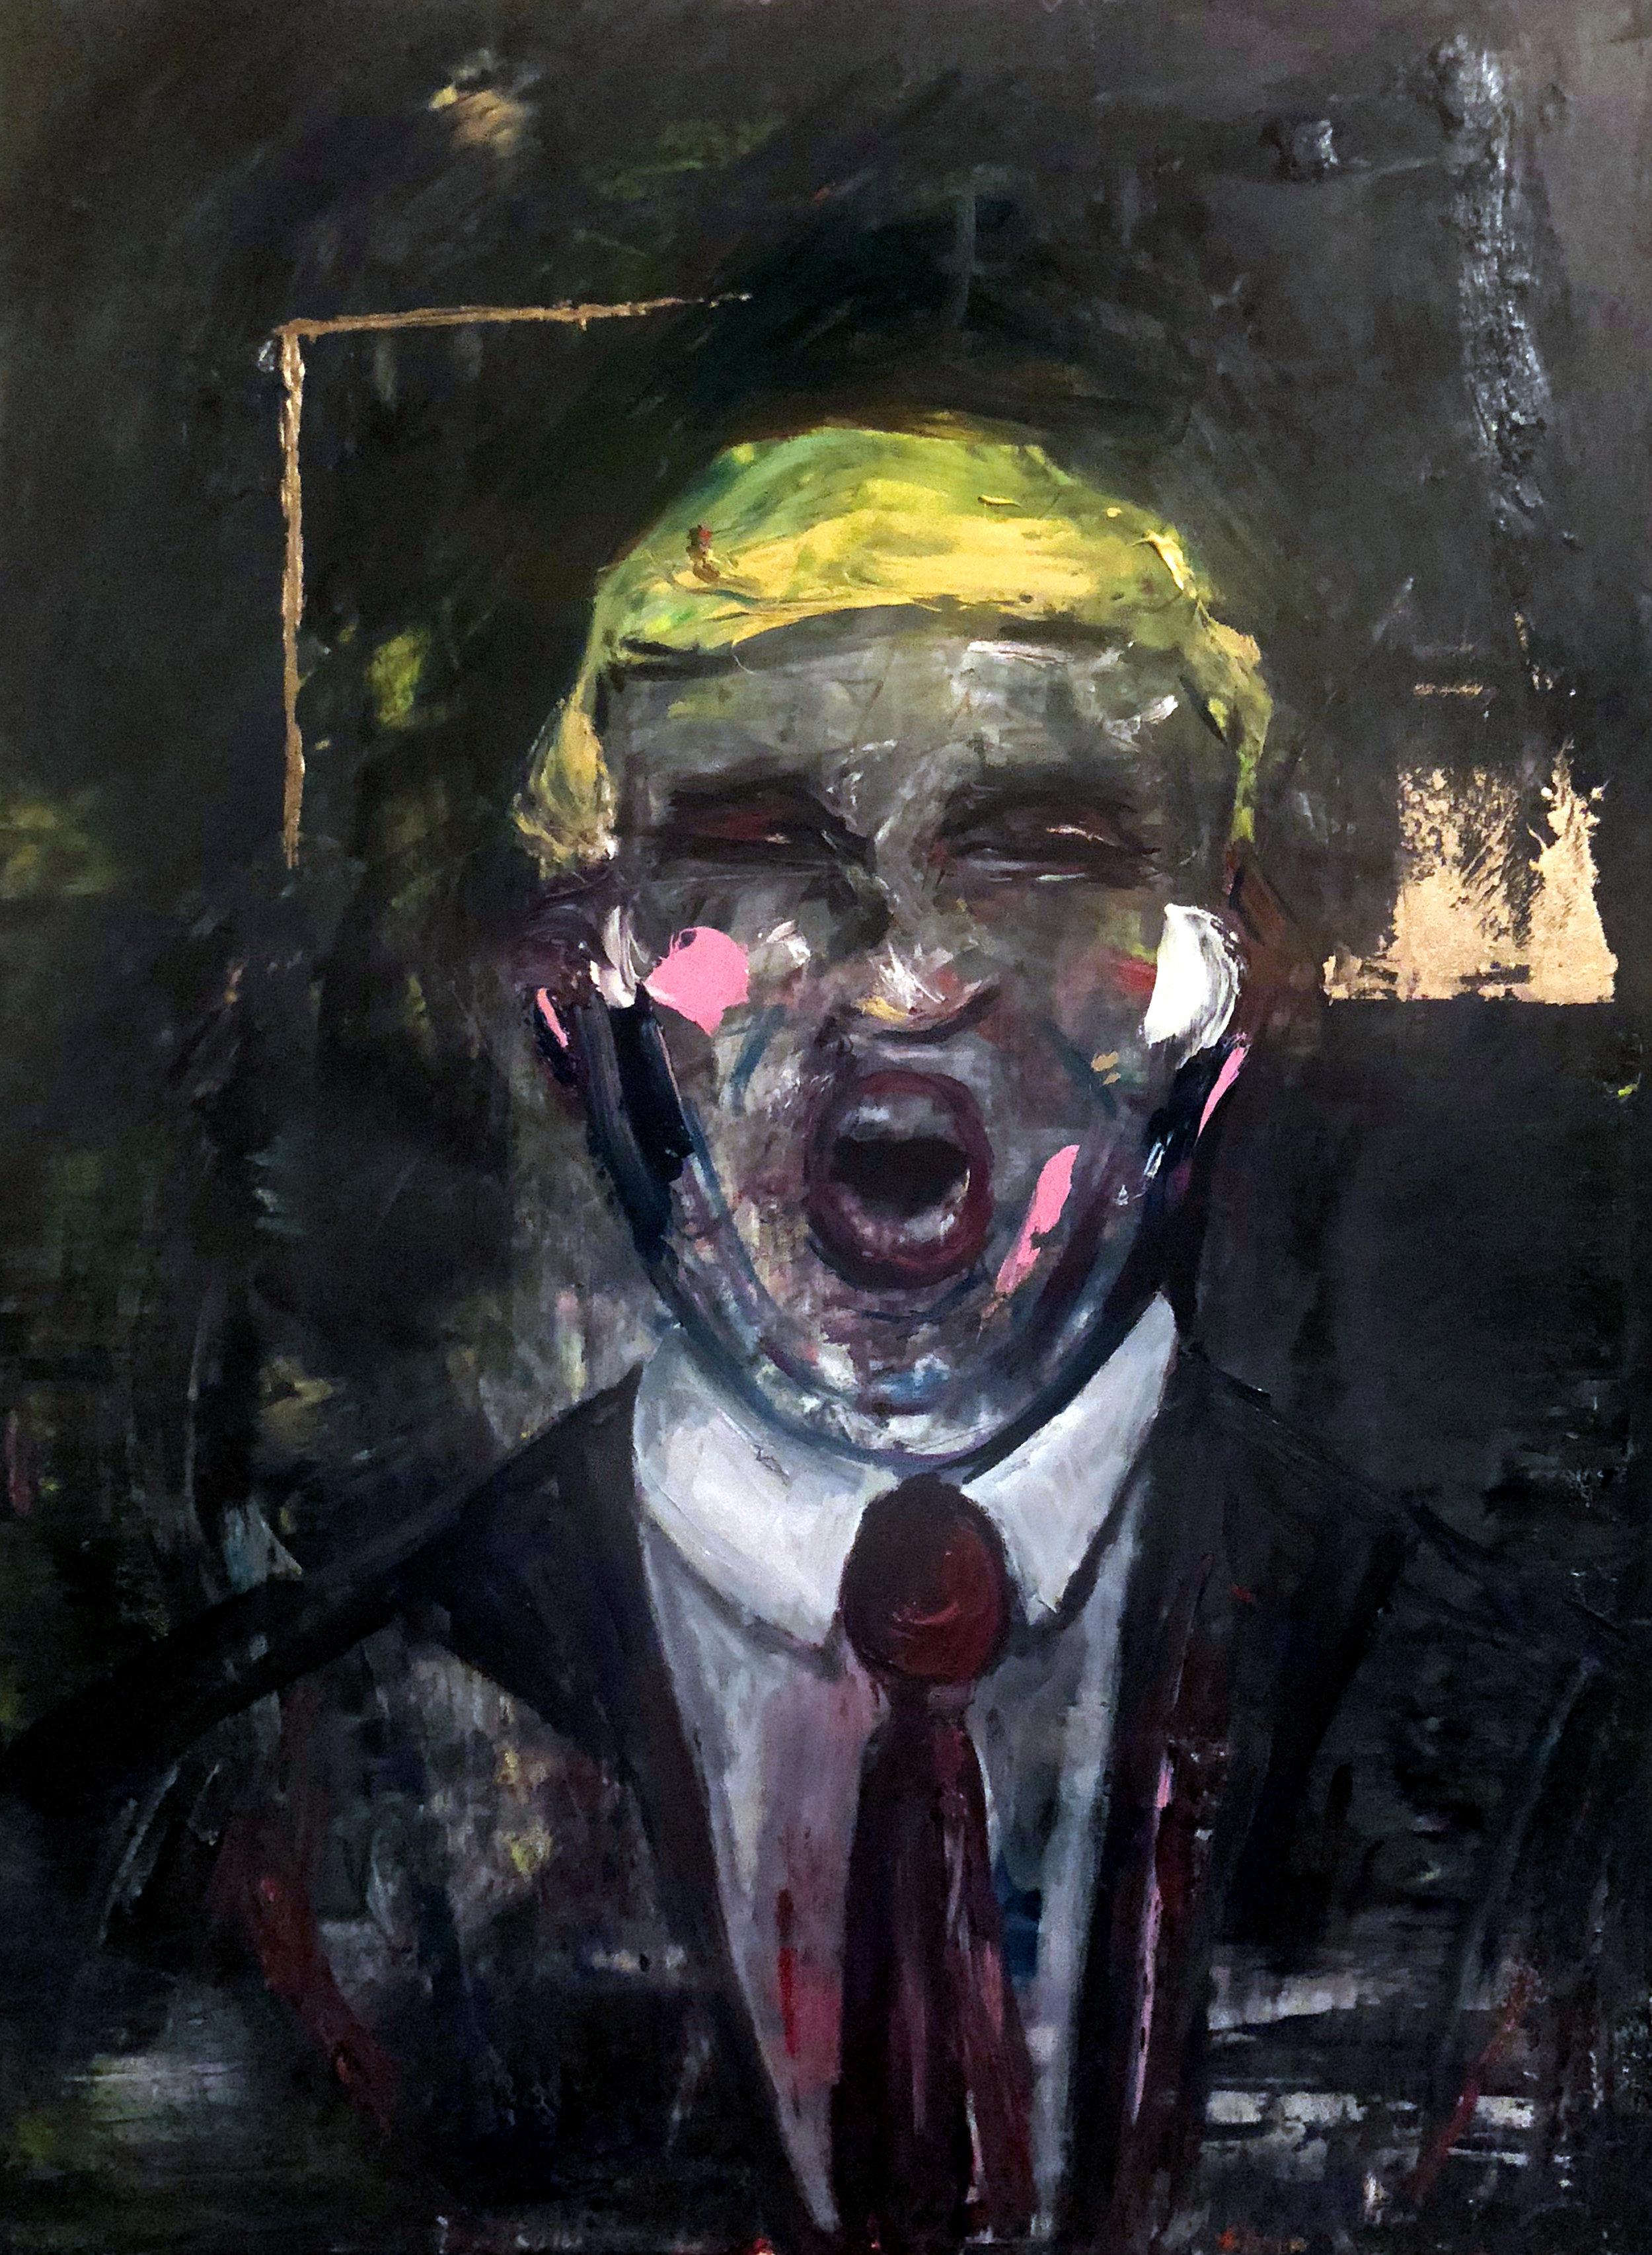 Deconstructed Portrait of Trump